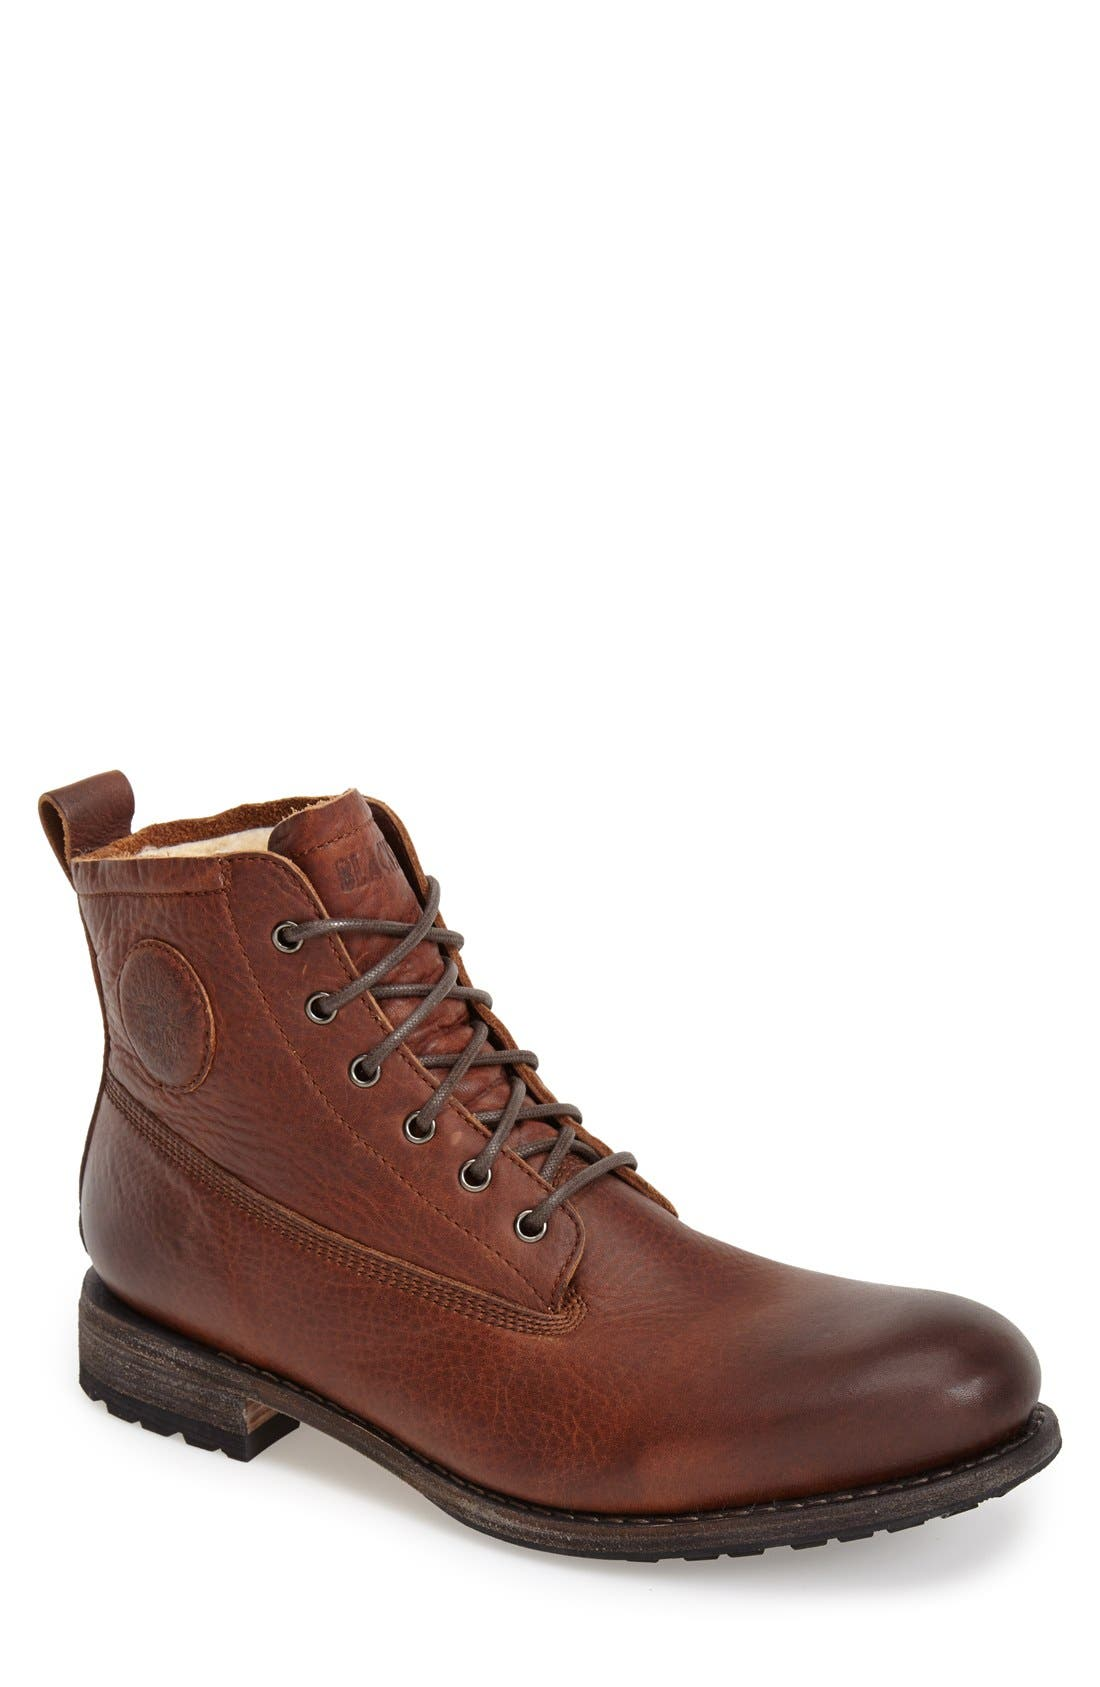 'Gull' Plain Toe Boot,                         Main,                         color,